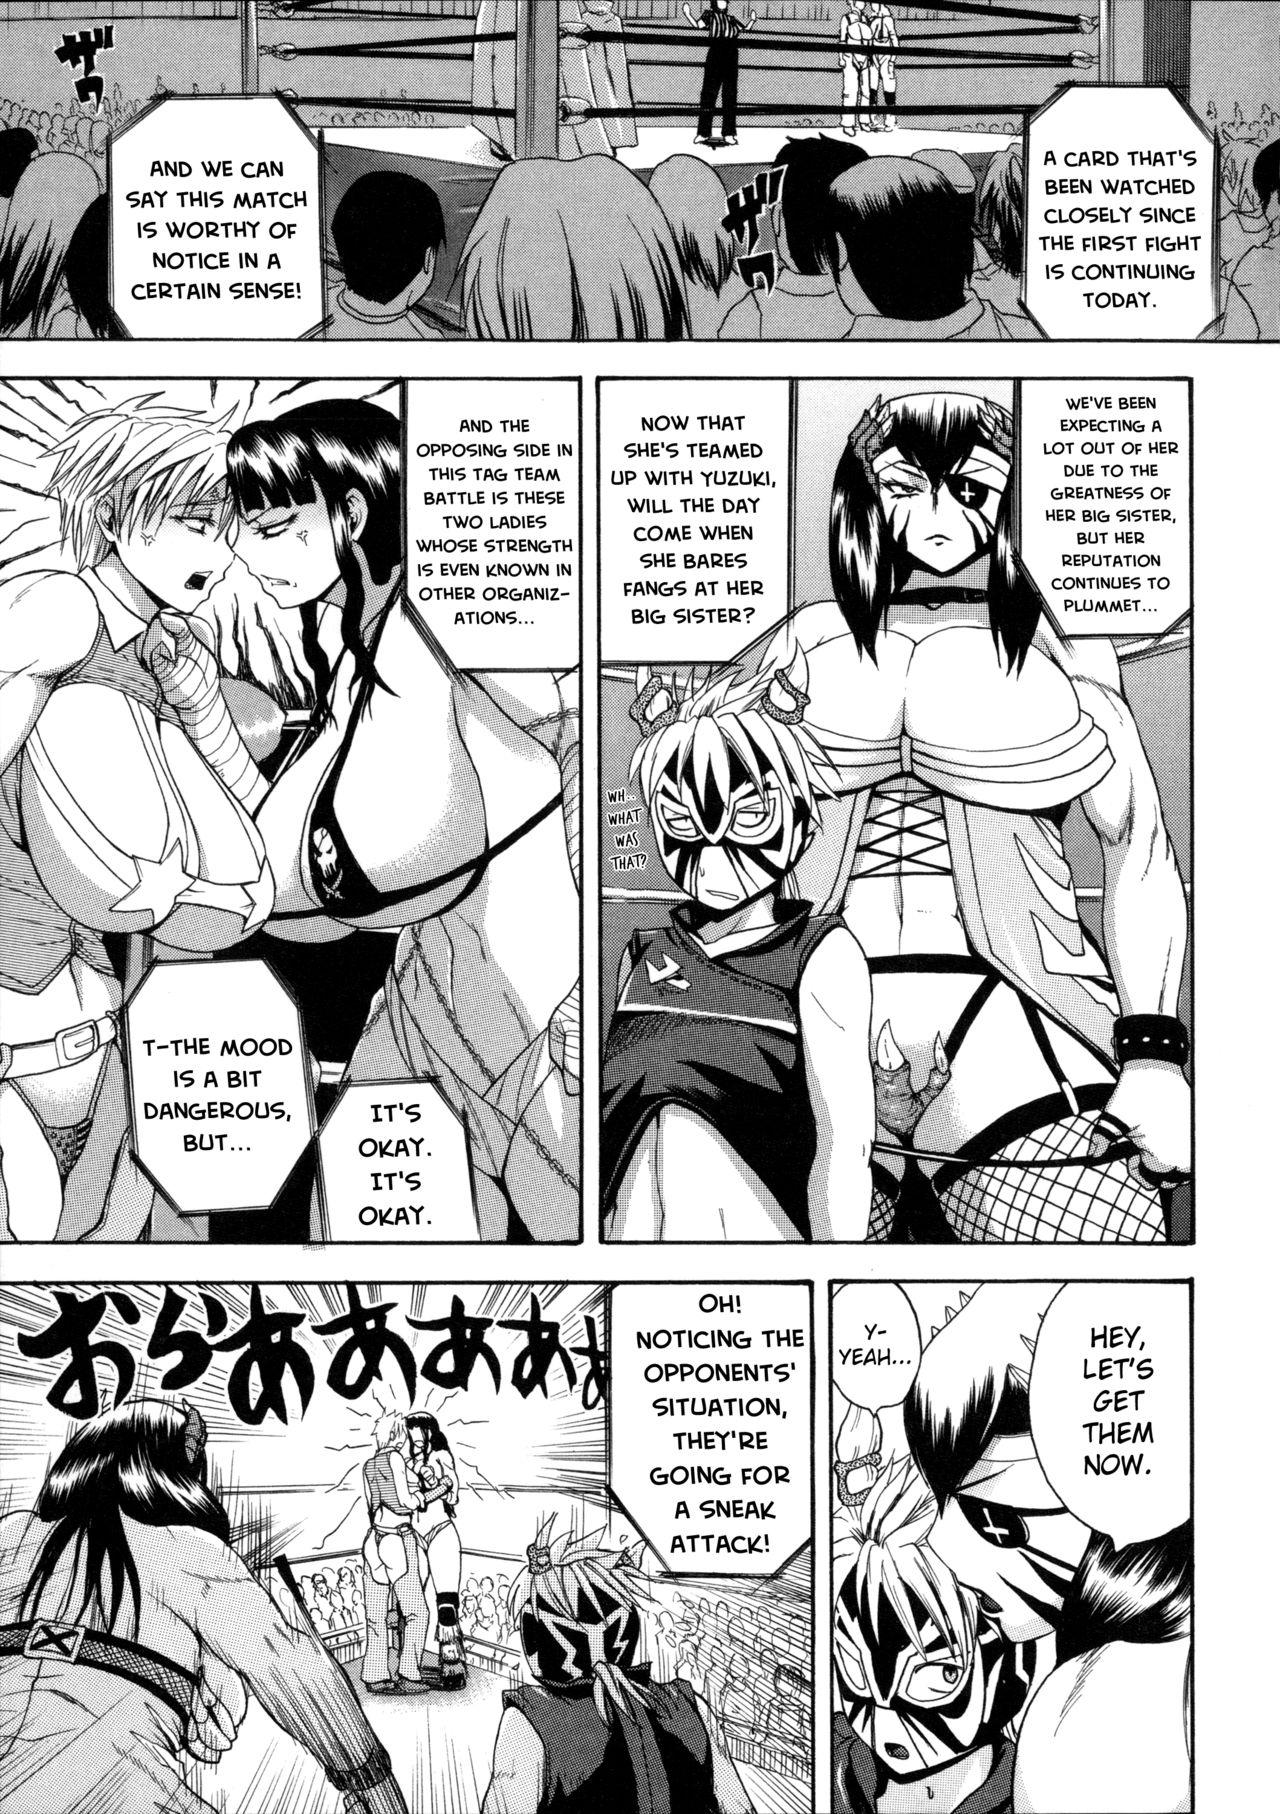 [Yoshimura Tatsumaki] Monzetsu Taigatame ~Count 3 de Ikasete Ageru~ | Faint in Agony Bodylock ~I'll make you cum on the count of 3~ [English] [Brolen] 109